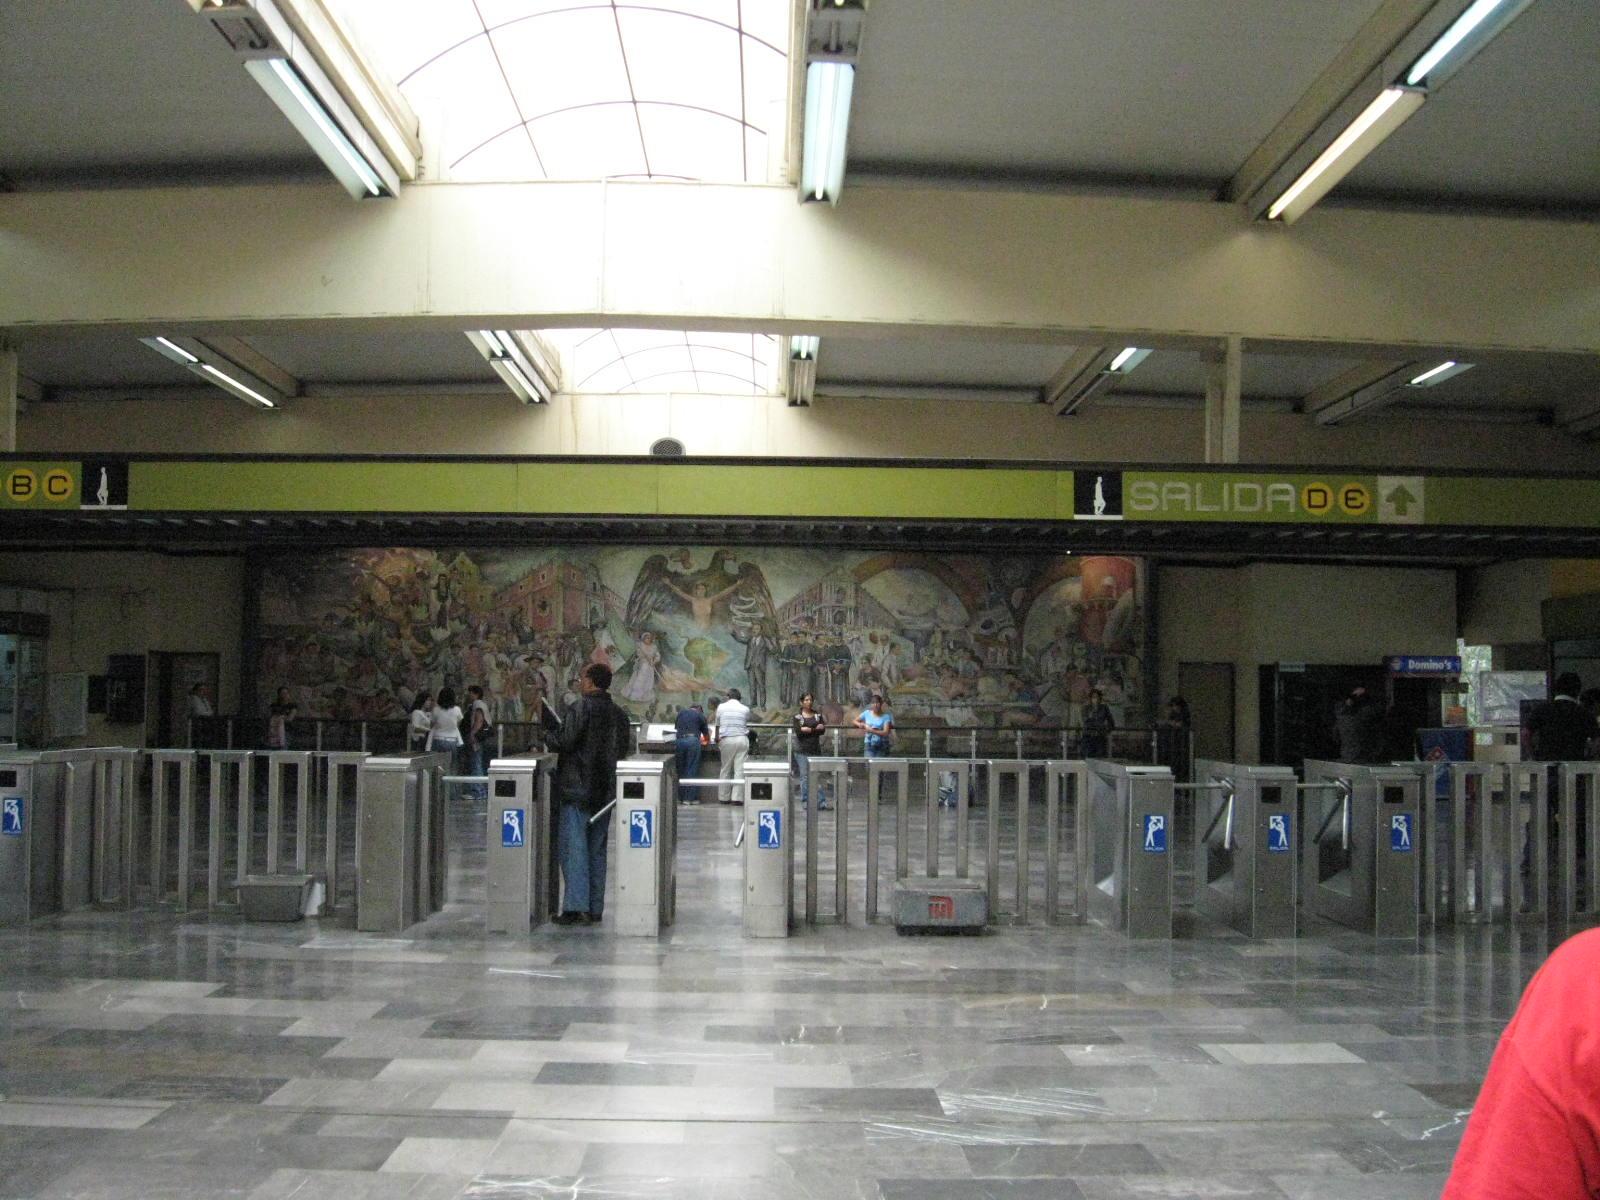 Metro universidad wikiwand for Mural metro u de chile